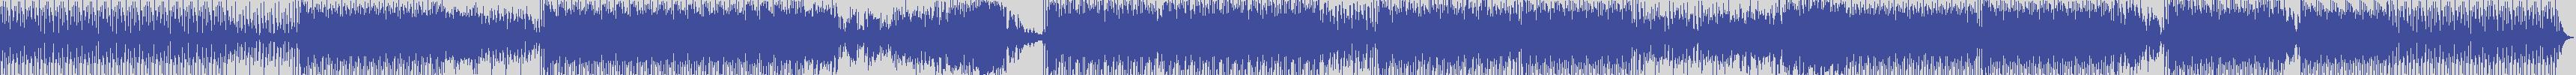 bunny_clan [BYC010] Max Esposito - Daisy Jazz [Vocal Mix] audio wave form